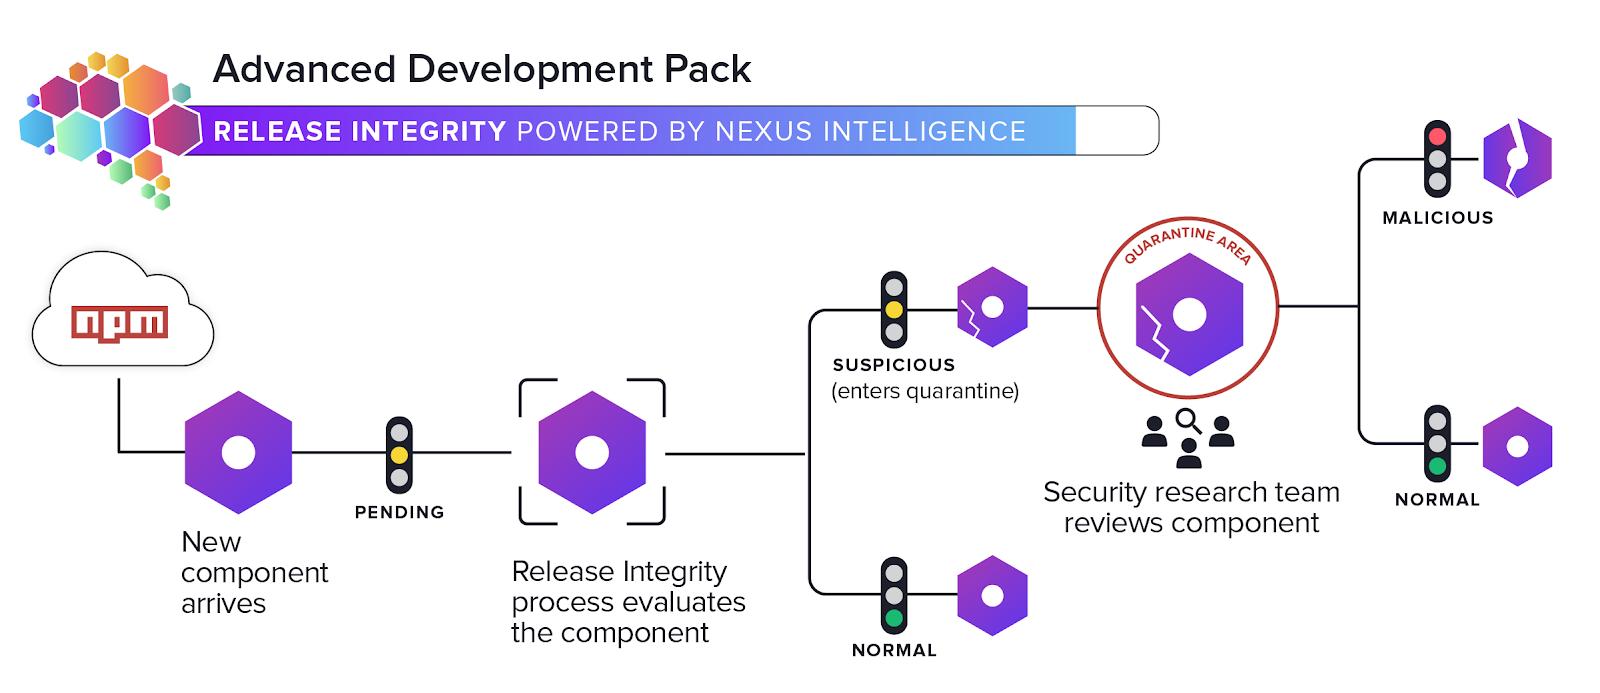 Advanced Development Pack: Release Integrity